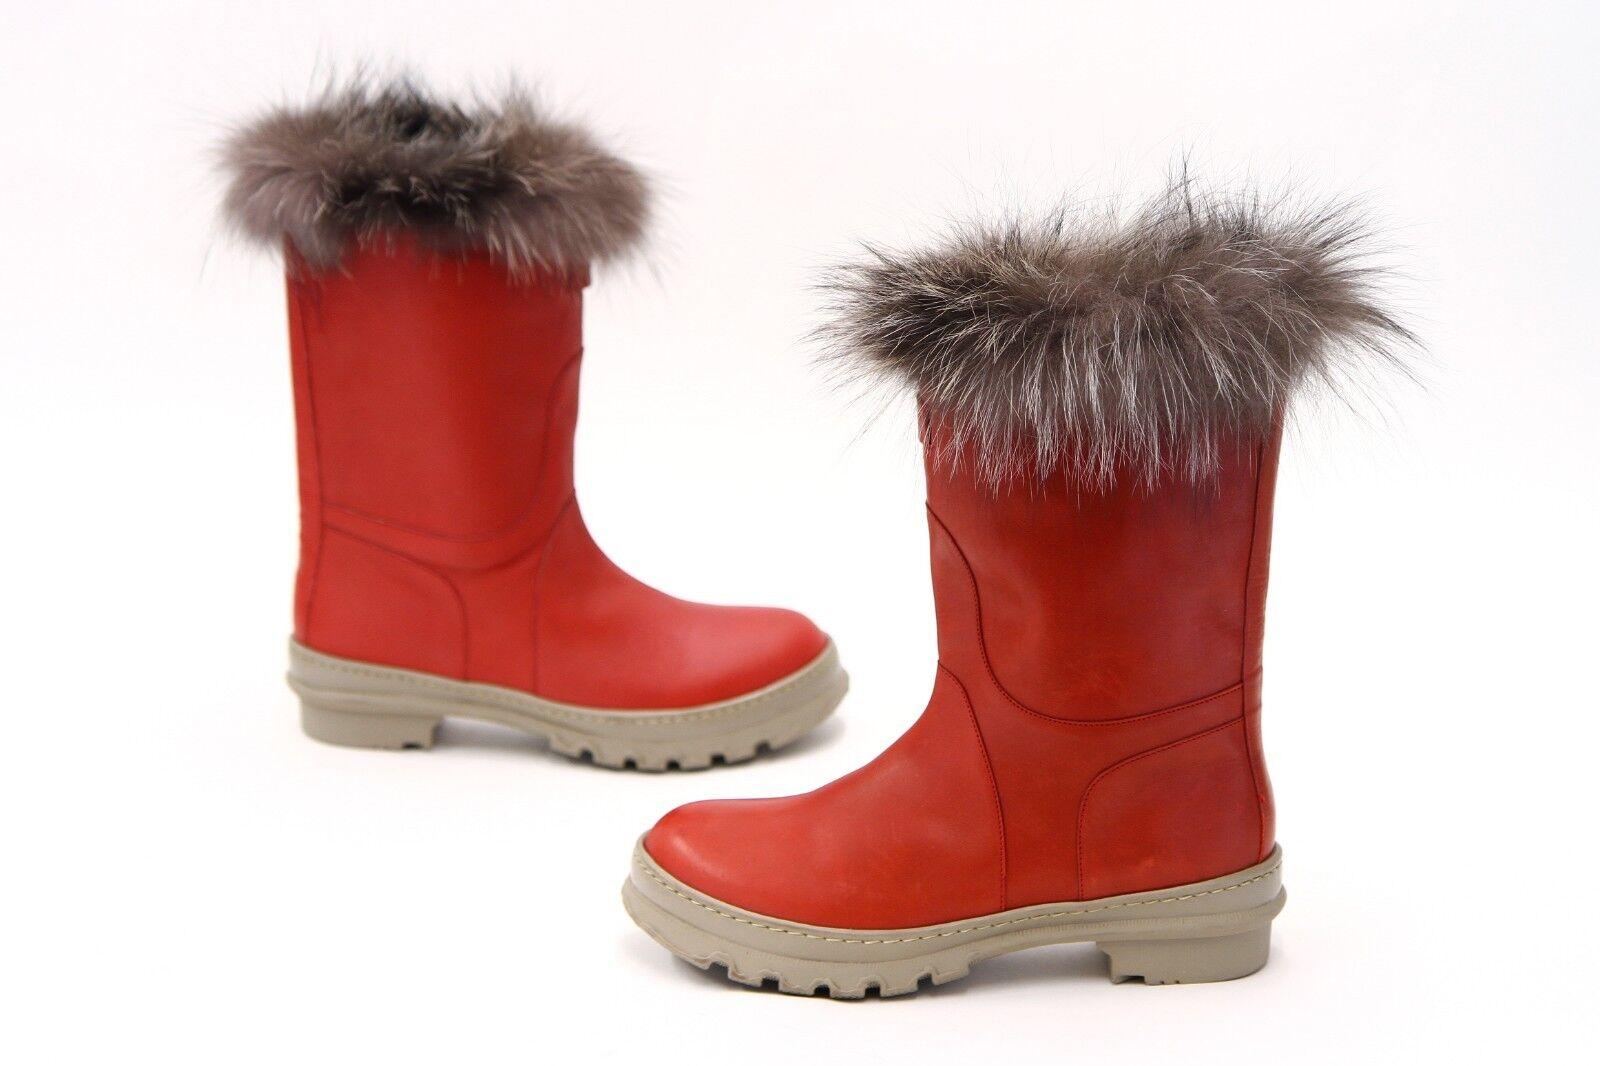 NWOB  2495 Brunello Cucinelli 100% Fur Fur Fur Trimmed Leather Snow Boots 40 10US  A181 f3b21d